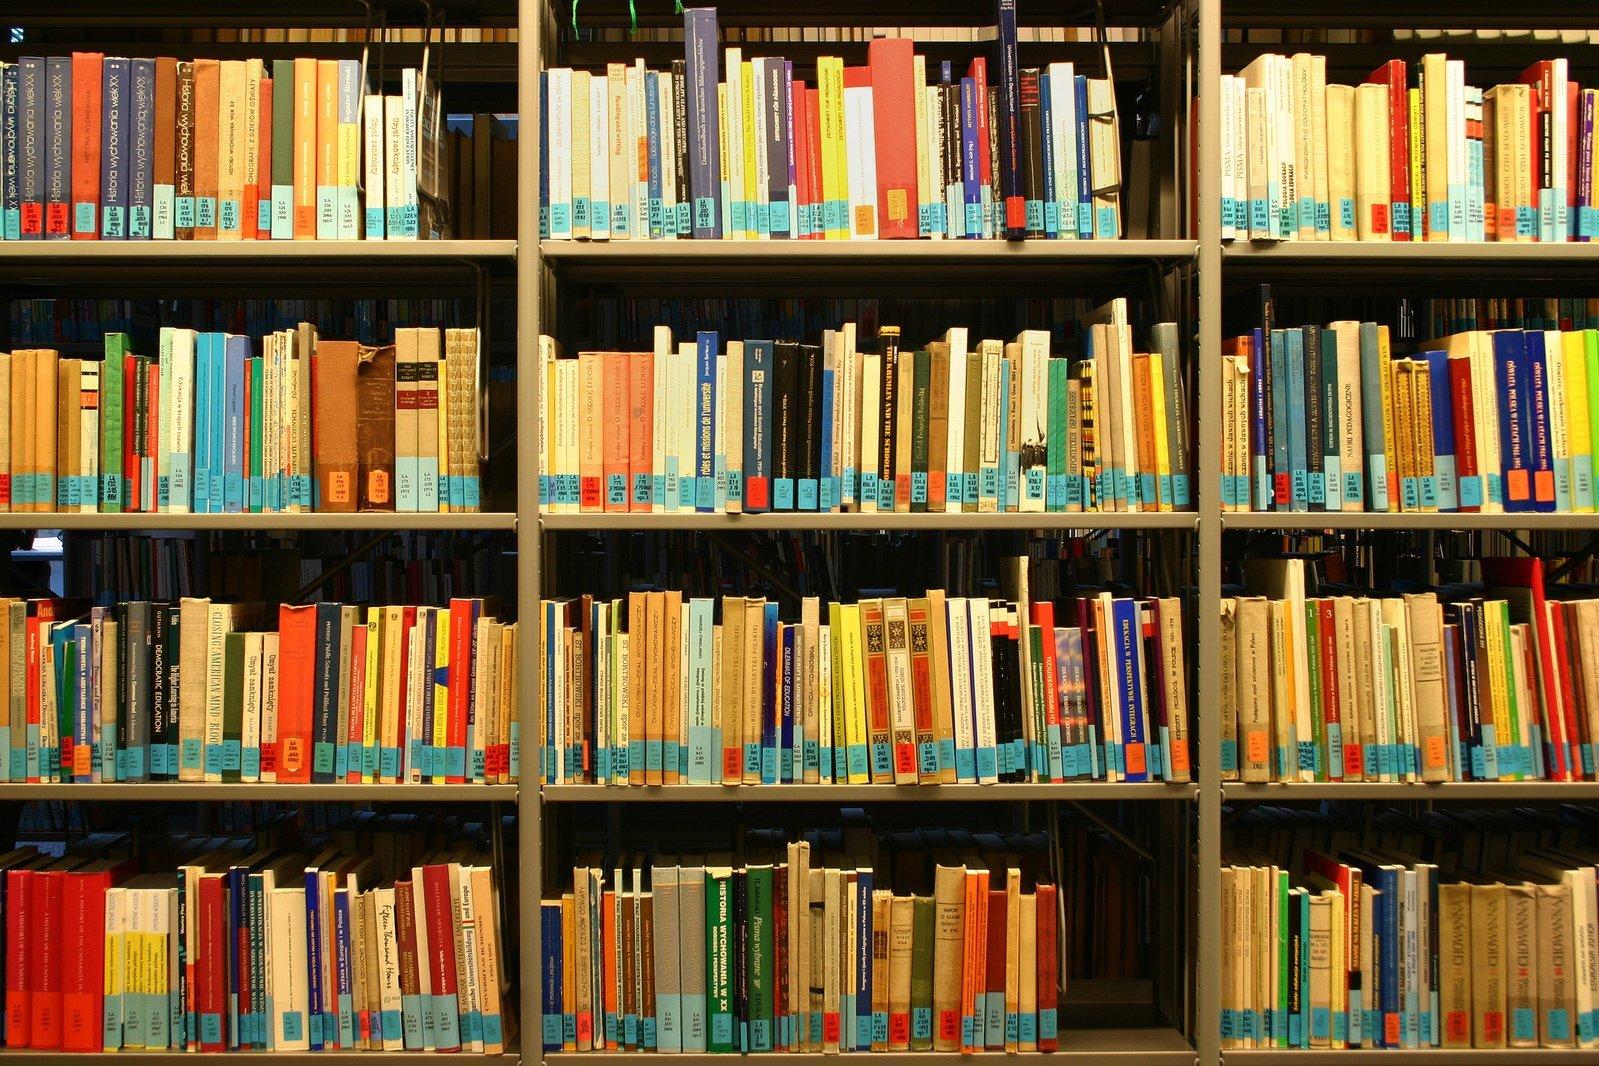 Gratis moro på biblioteket